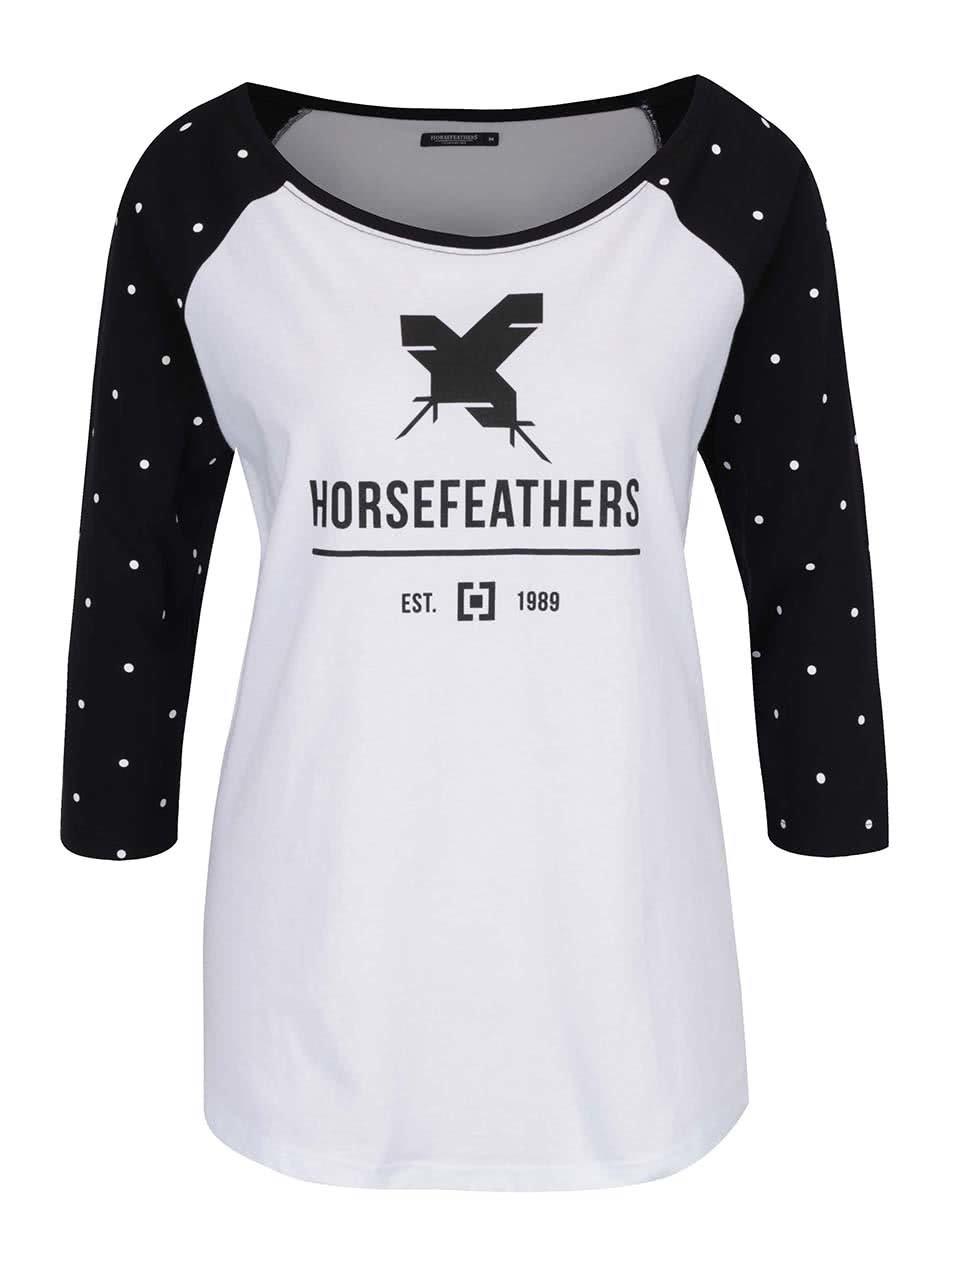 Čierno-biele dámske tričko s 3 4 rukávom Horsefeathers Justine ... 3215c222253